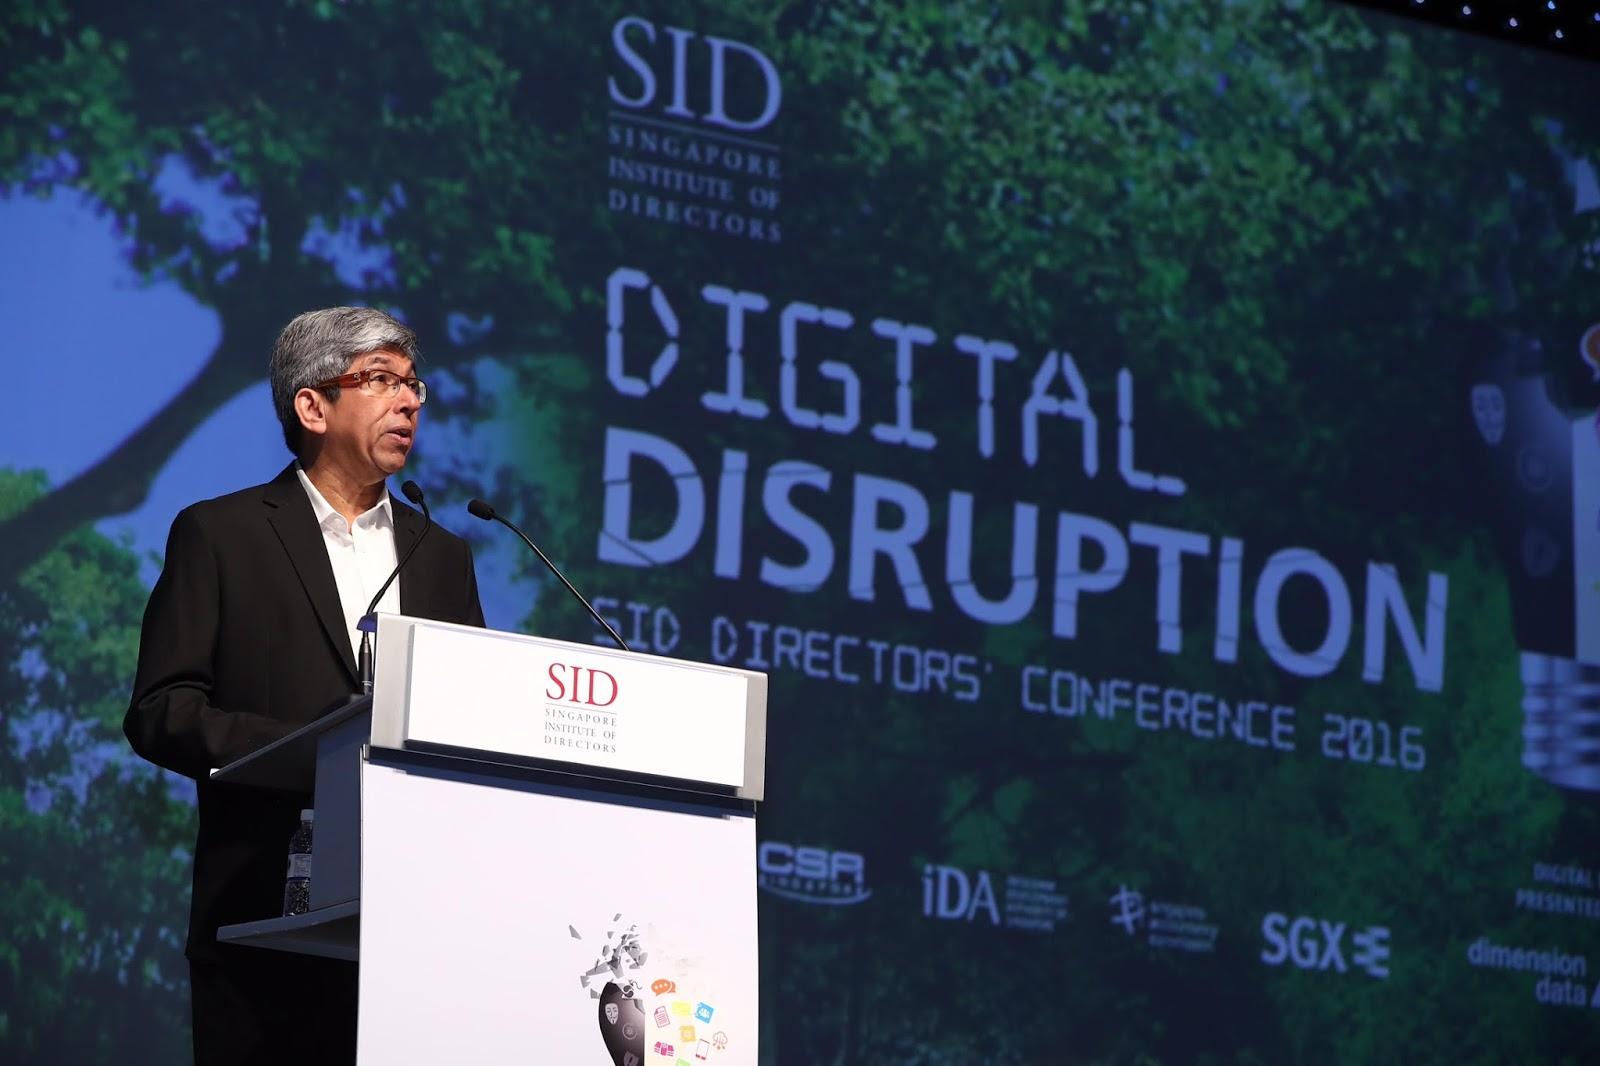 Singapore Institute of Directors Directors' Conference 2016